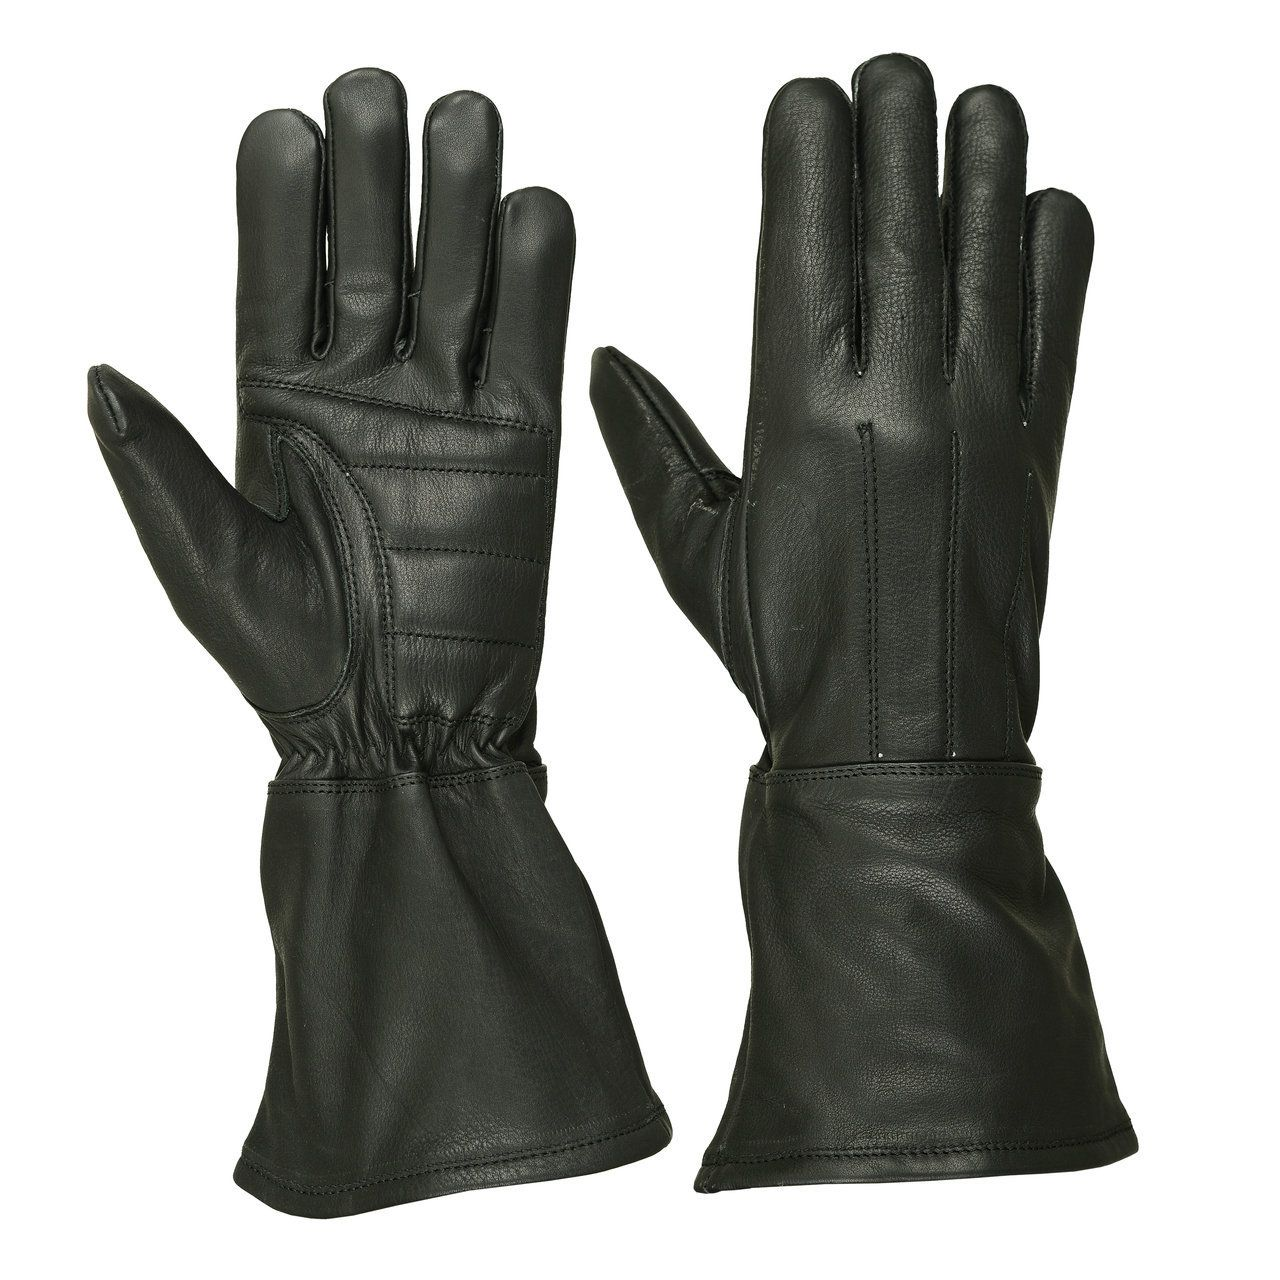 Mens deerskin gloves - Men S Gloves Men S Deerskin Gloves Hugger Gloves